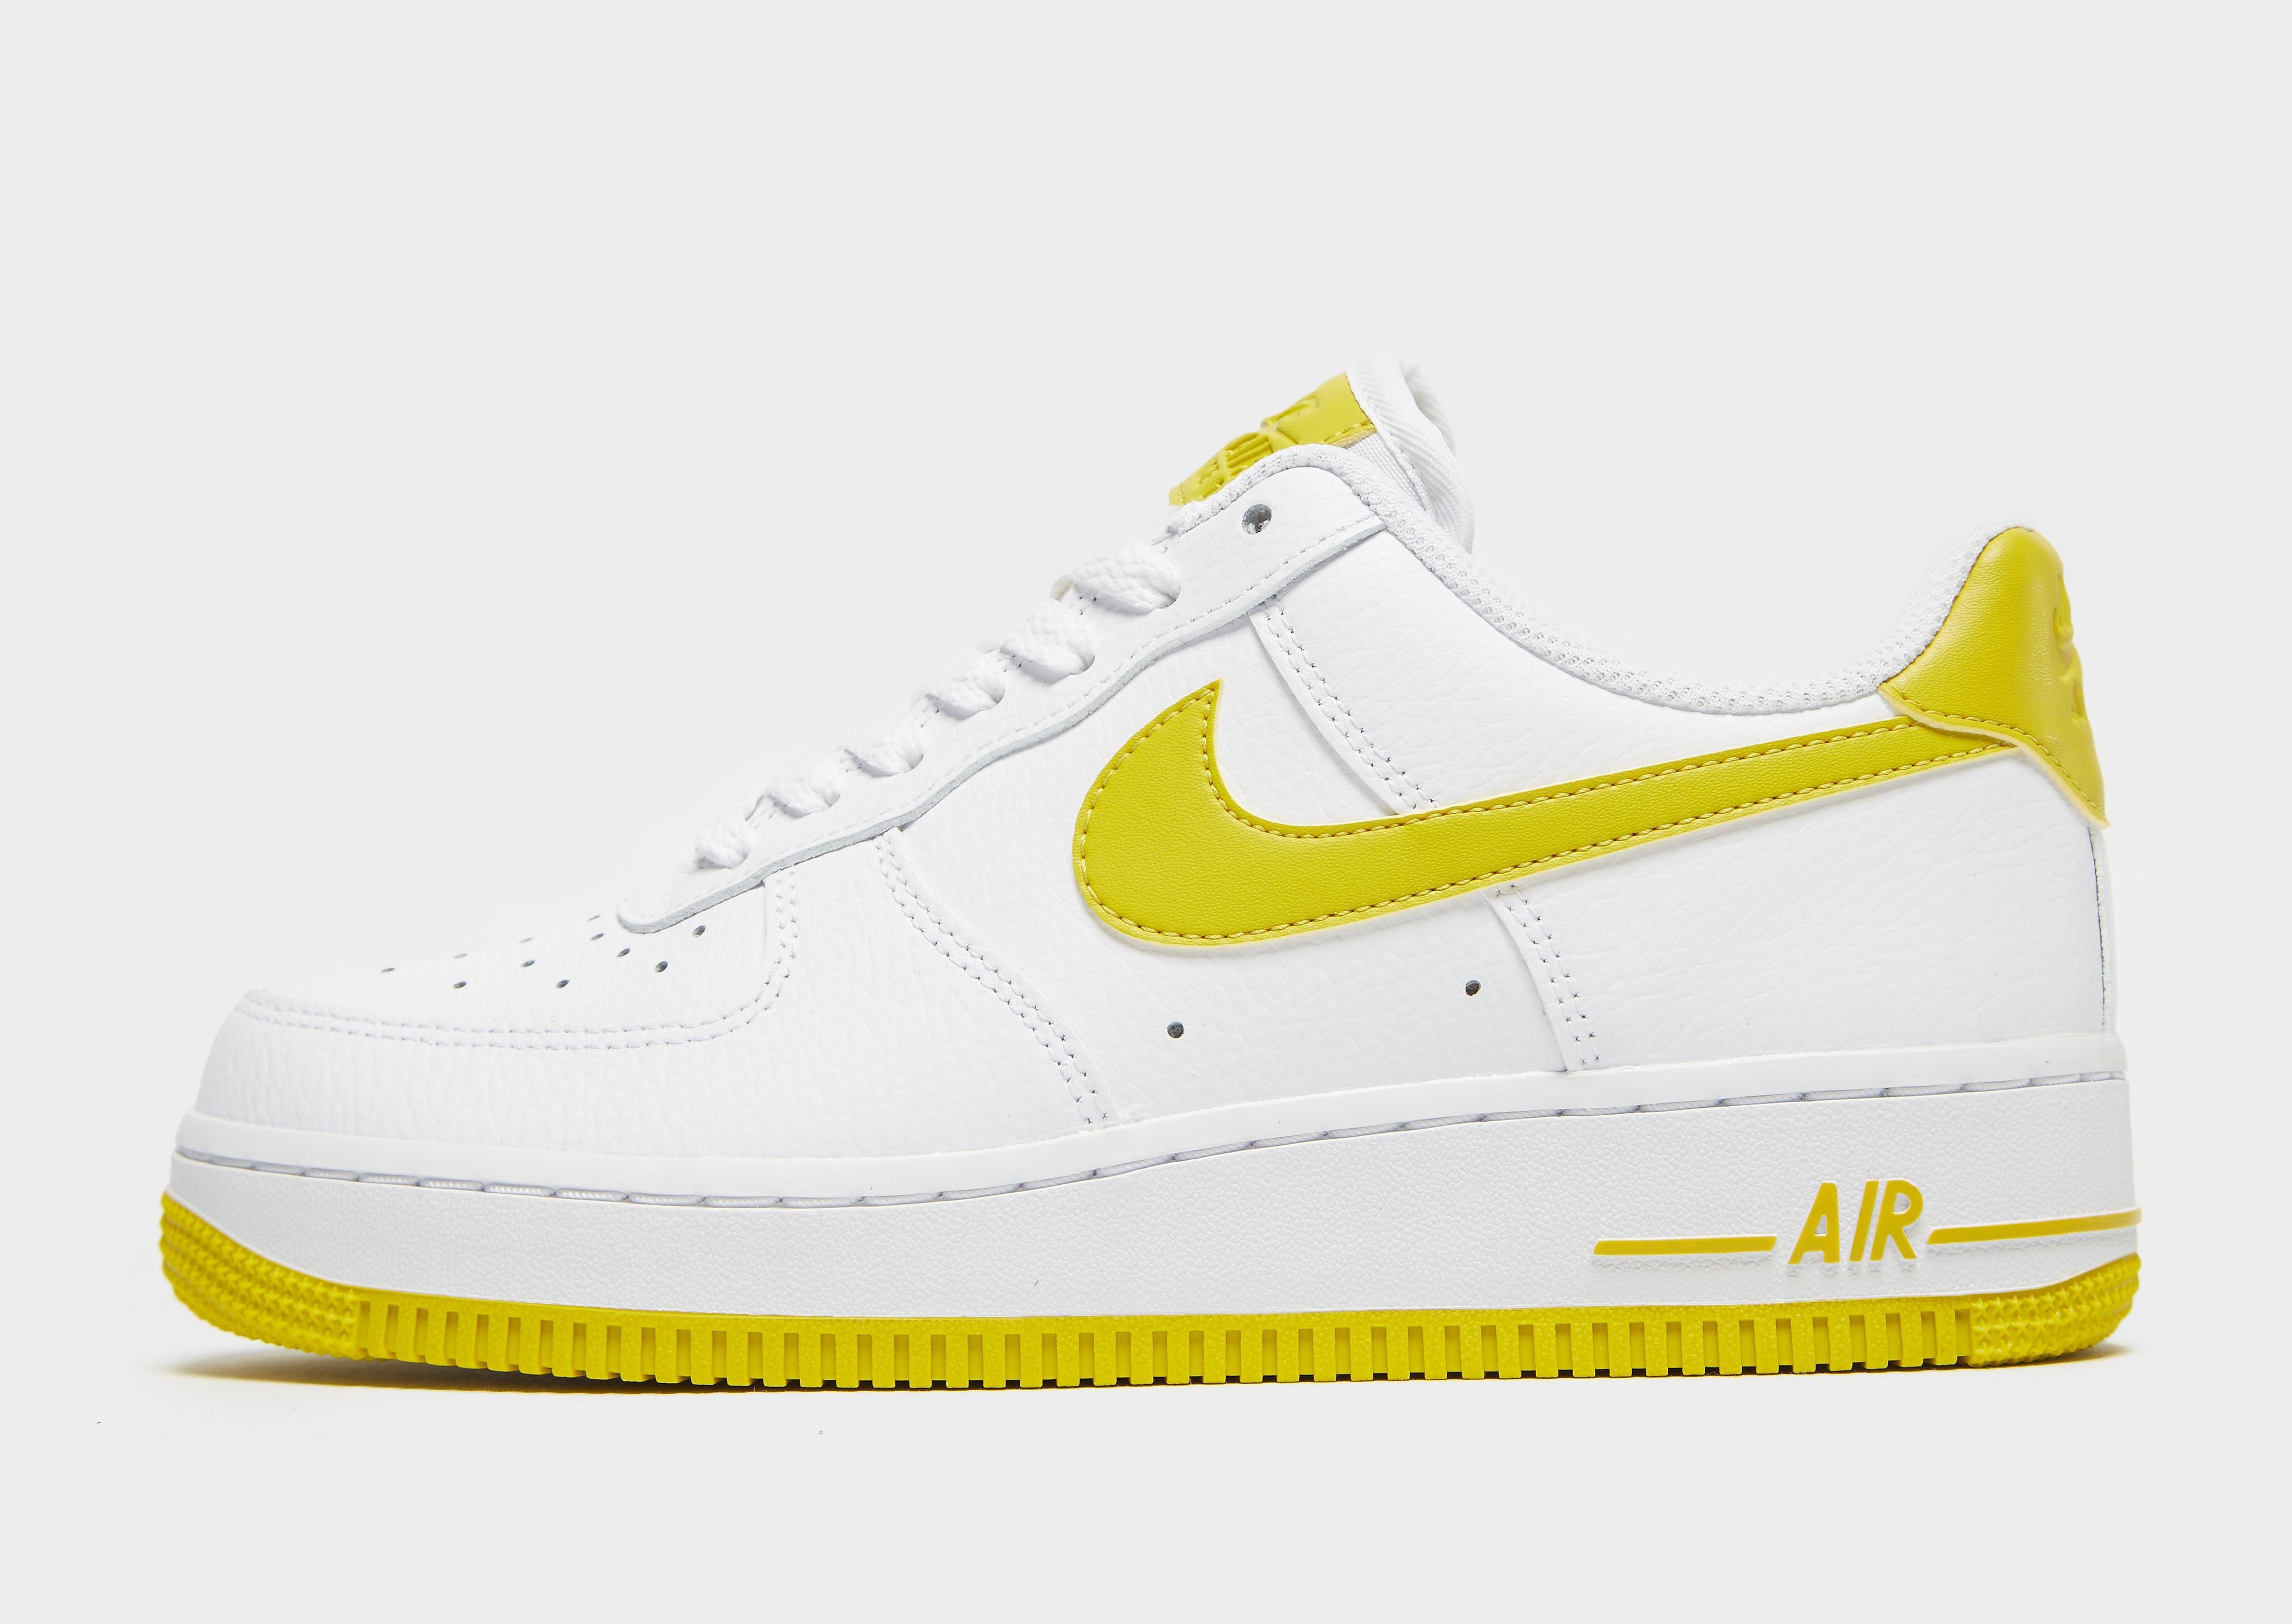 Nike Air Force 1 '07 LV8 Dam